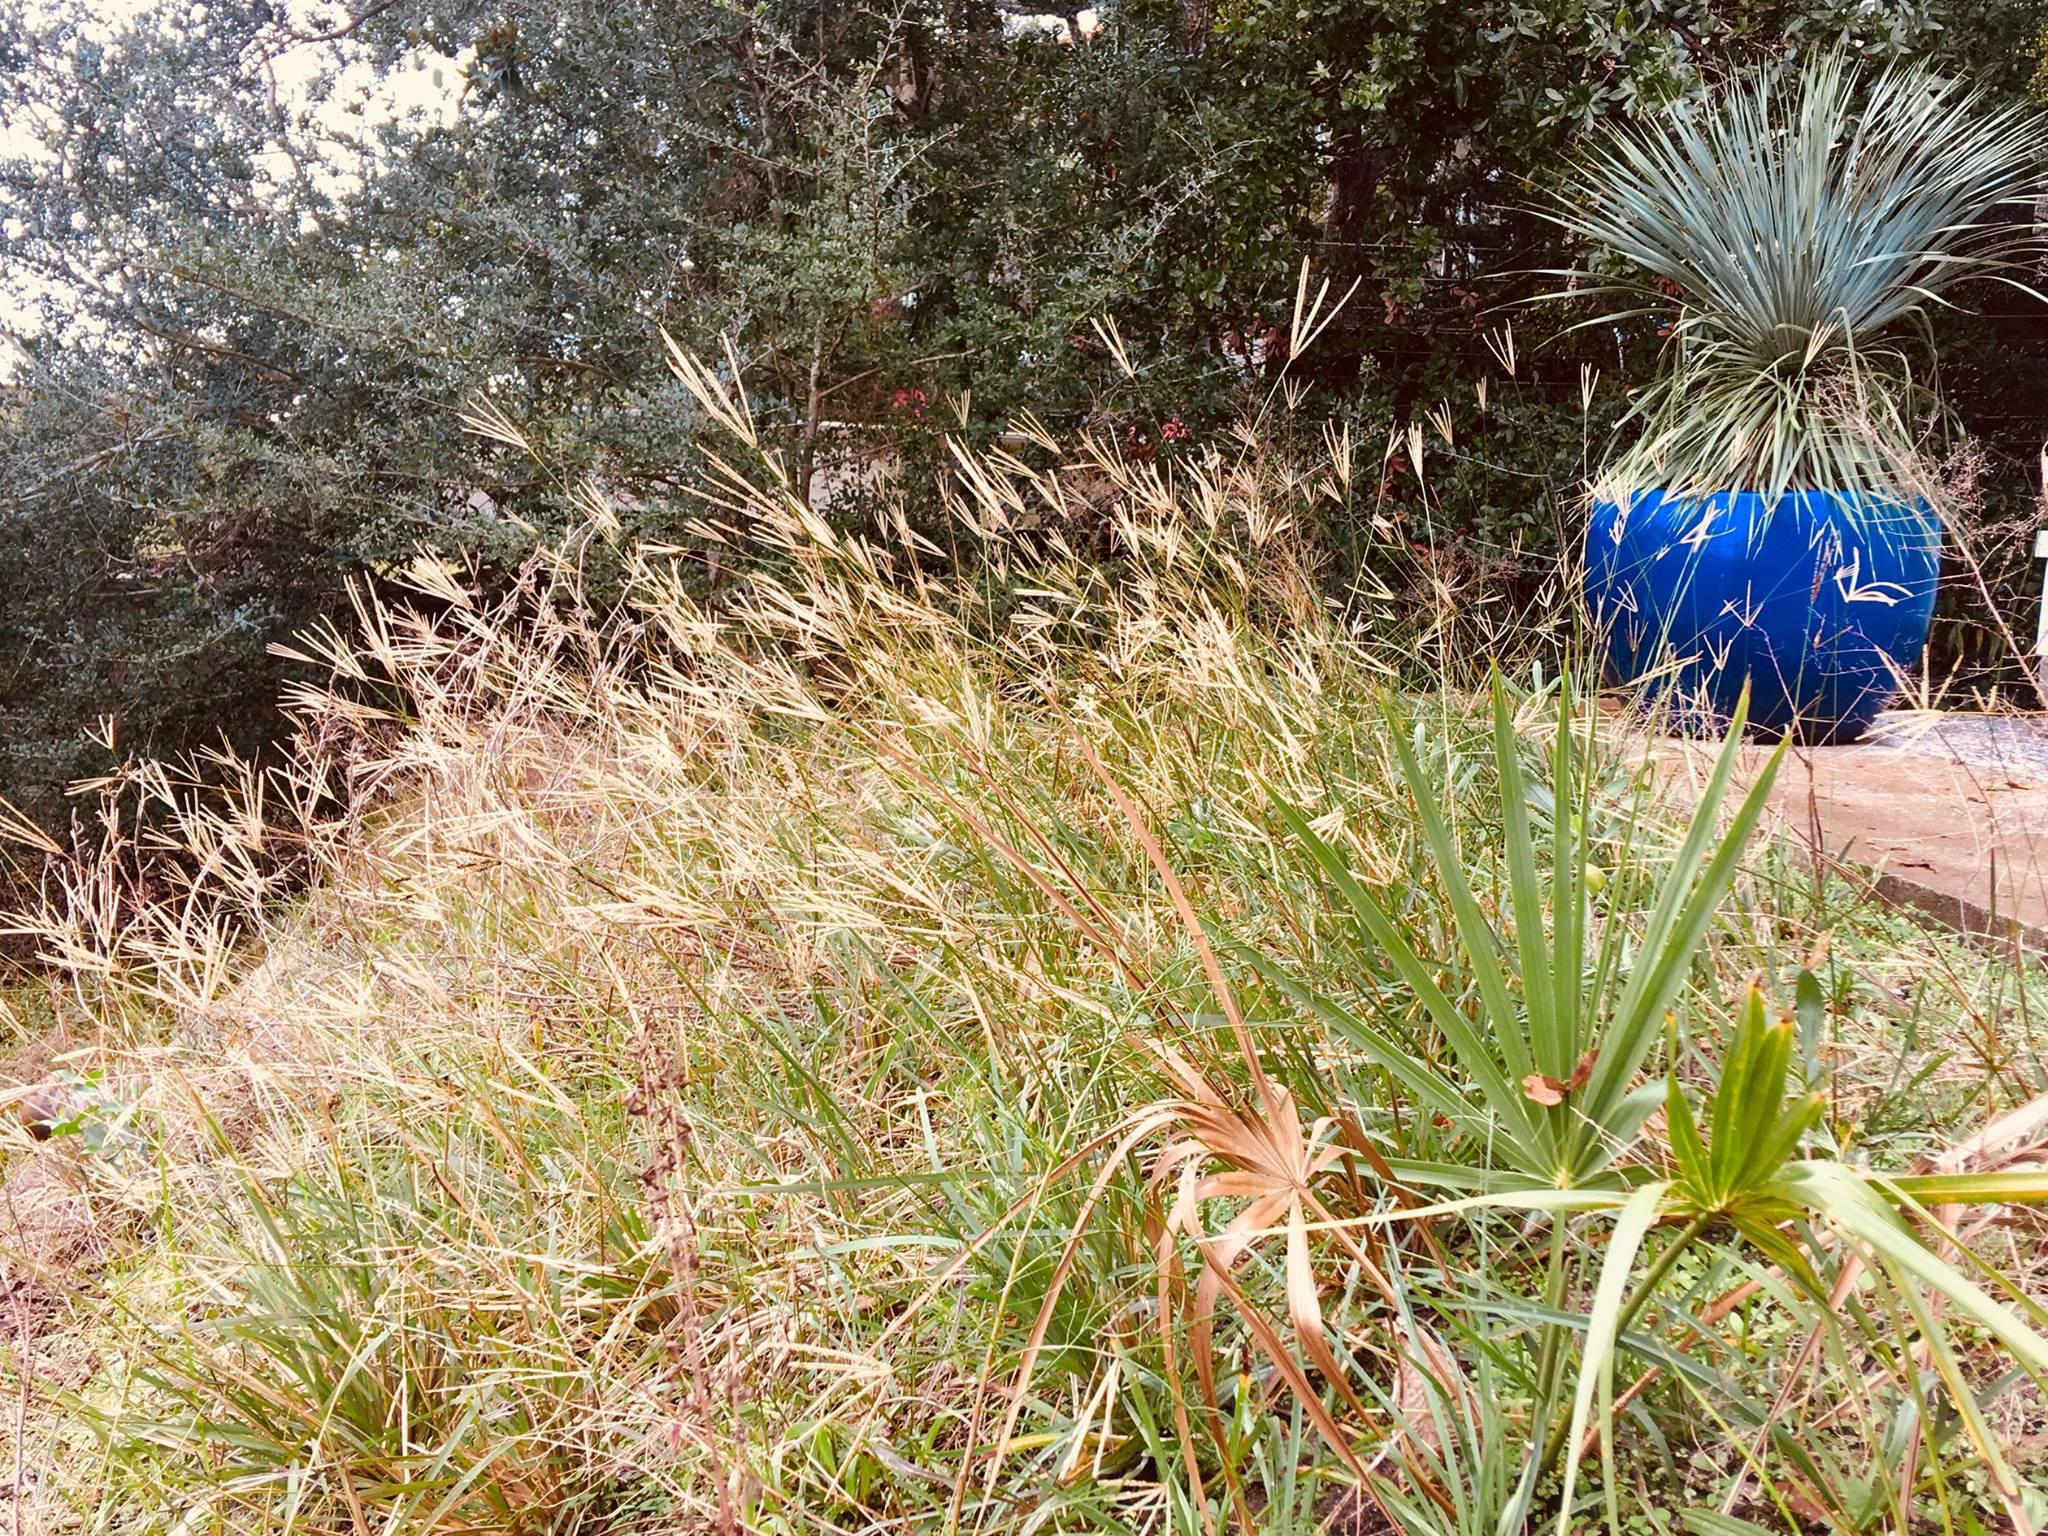 Image Related To Eustachys petraea (Dune Finger-grass)